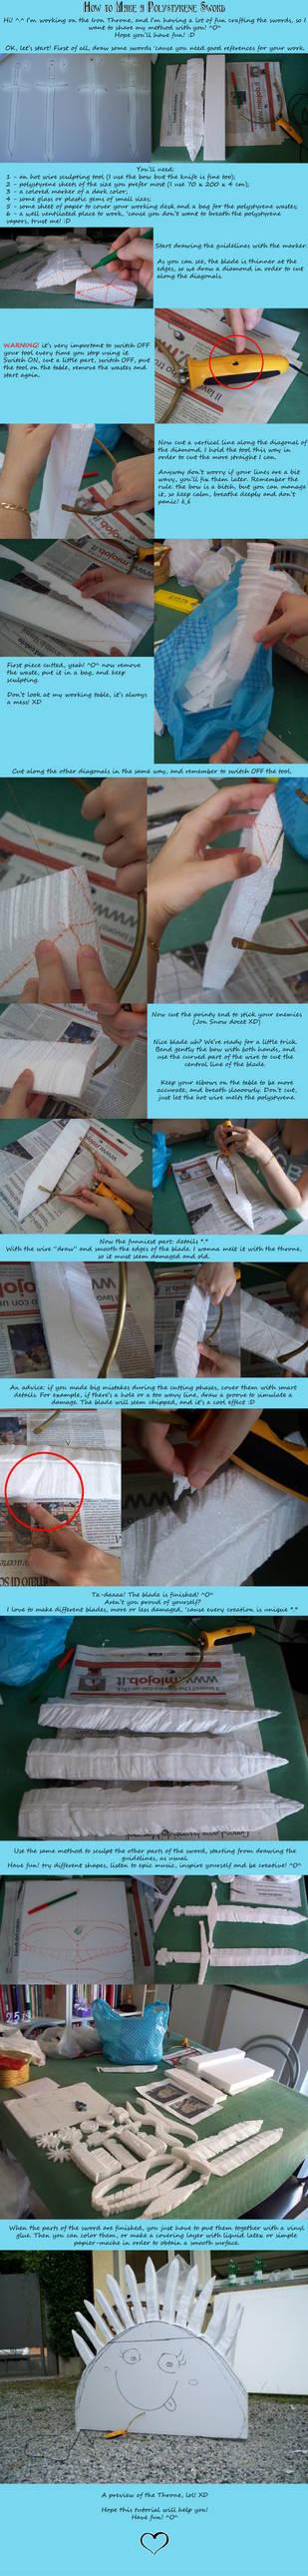 Polystyrene Sword Tutorial by CalamityJade